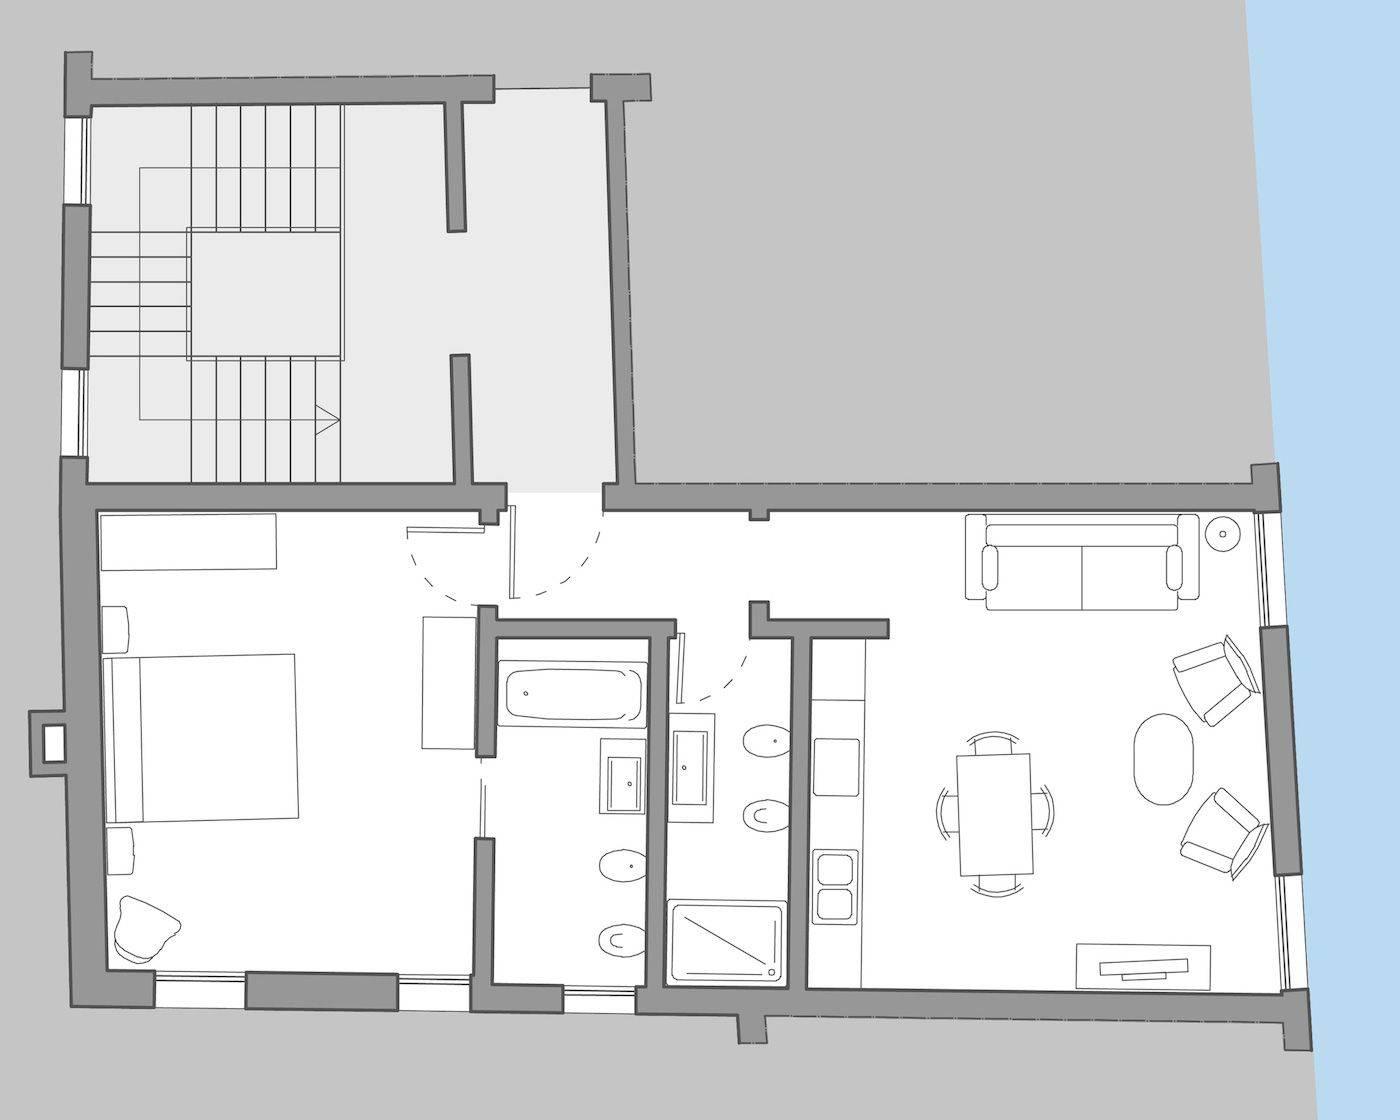 Tiepolo floor plan